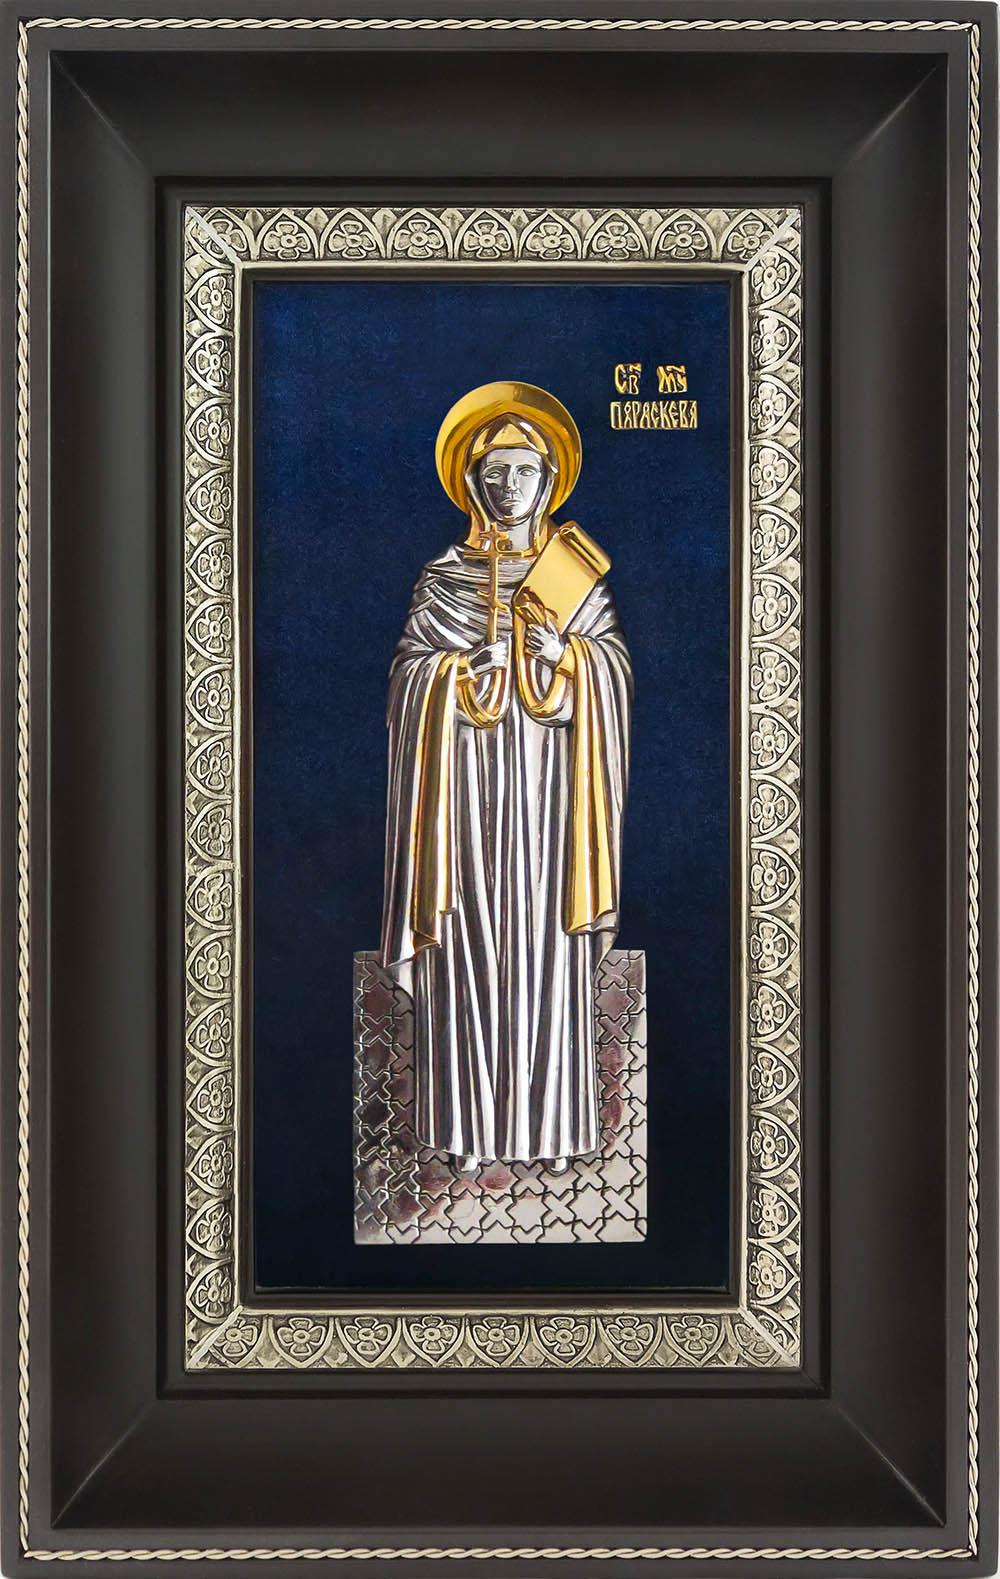 фото икона святая великомученица Параскева Пятница гальванопластика золото серебро